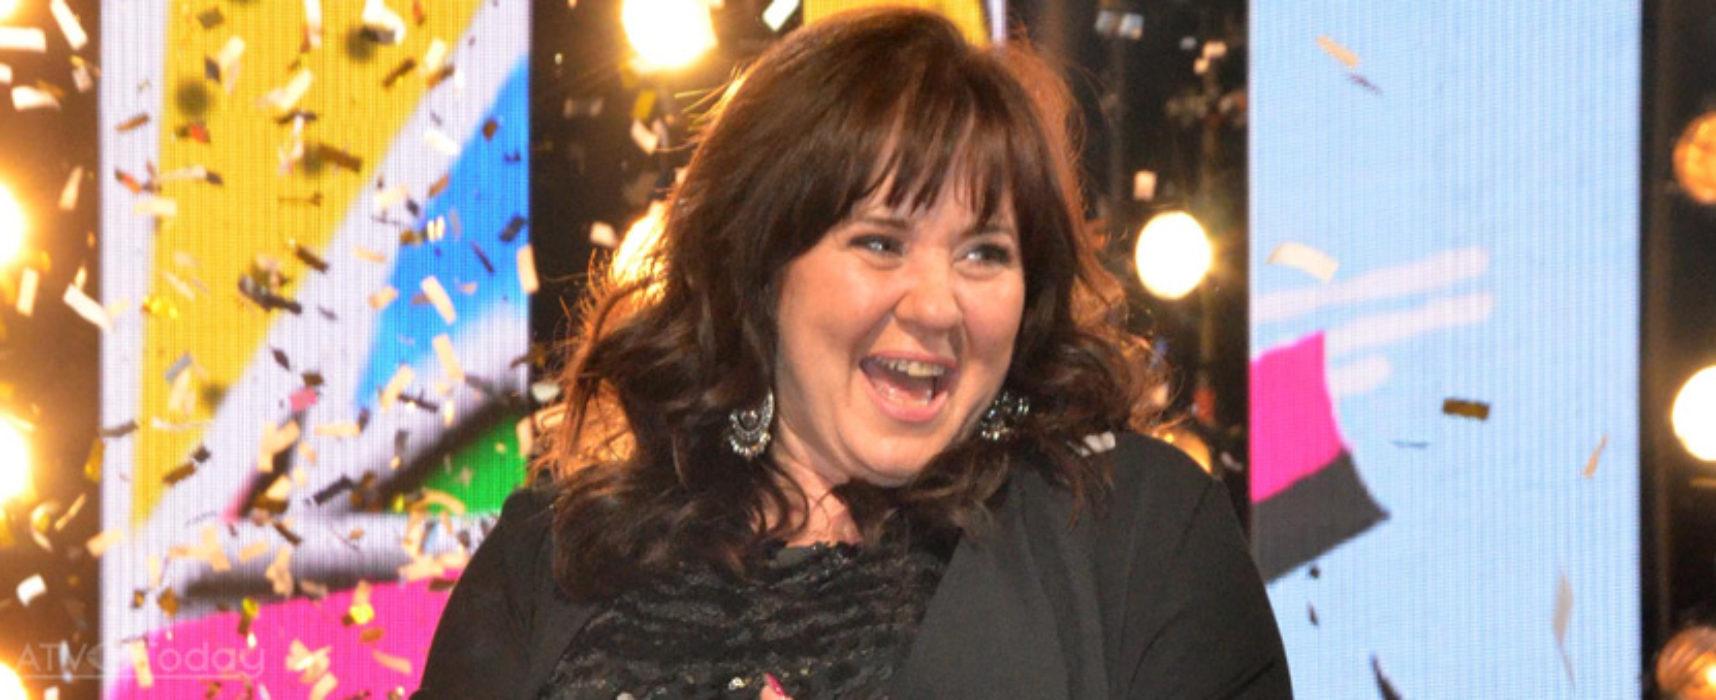 Coleen Nolan talks about 'that' Loose Women segment with Kim Woodburn